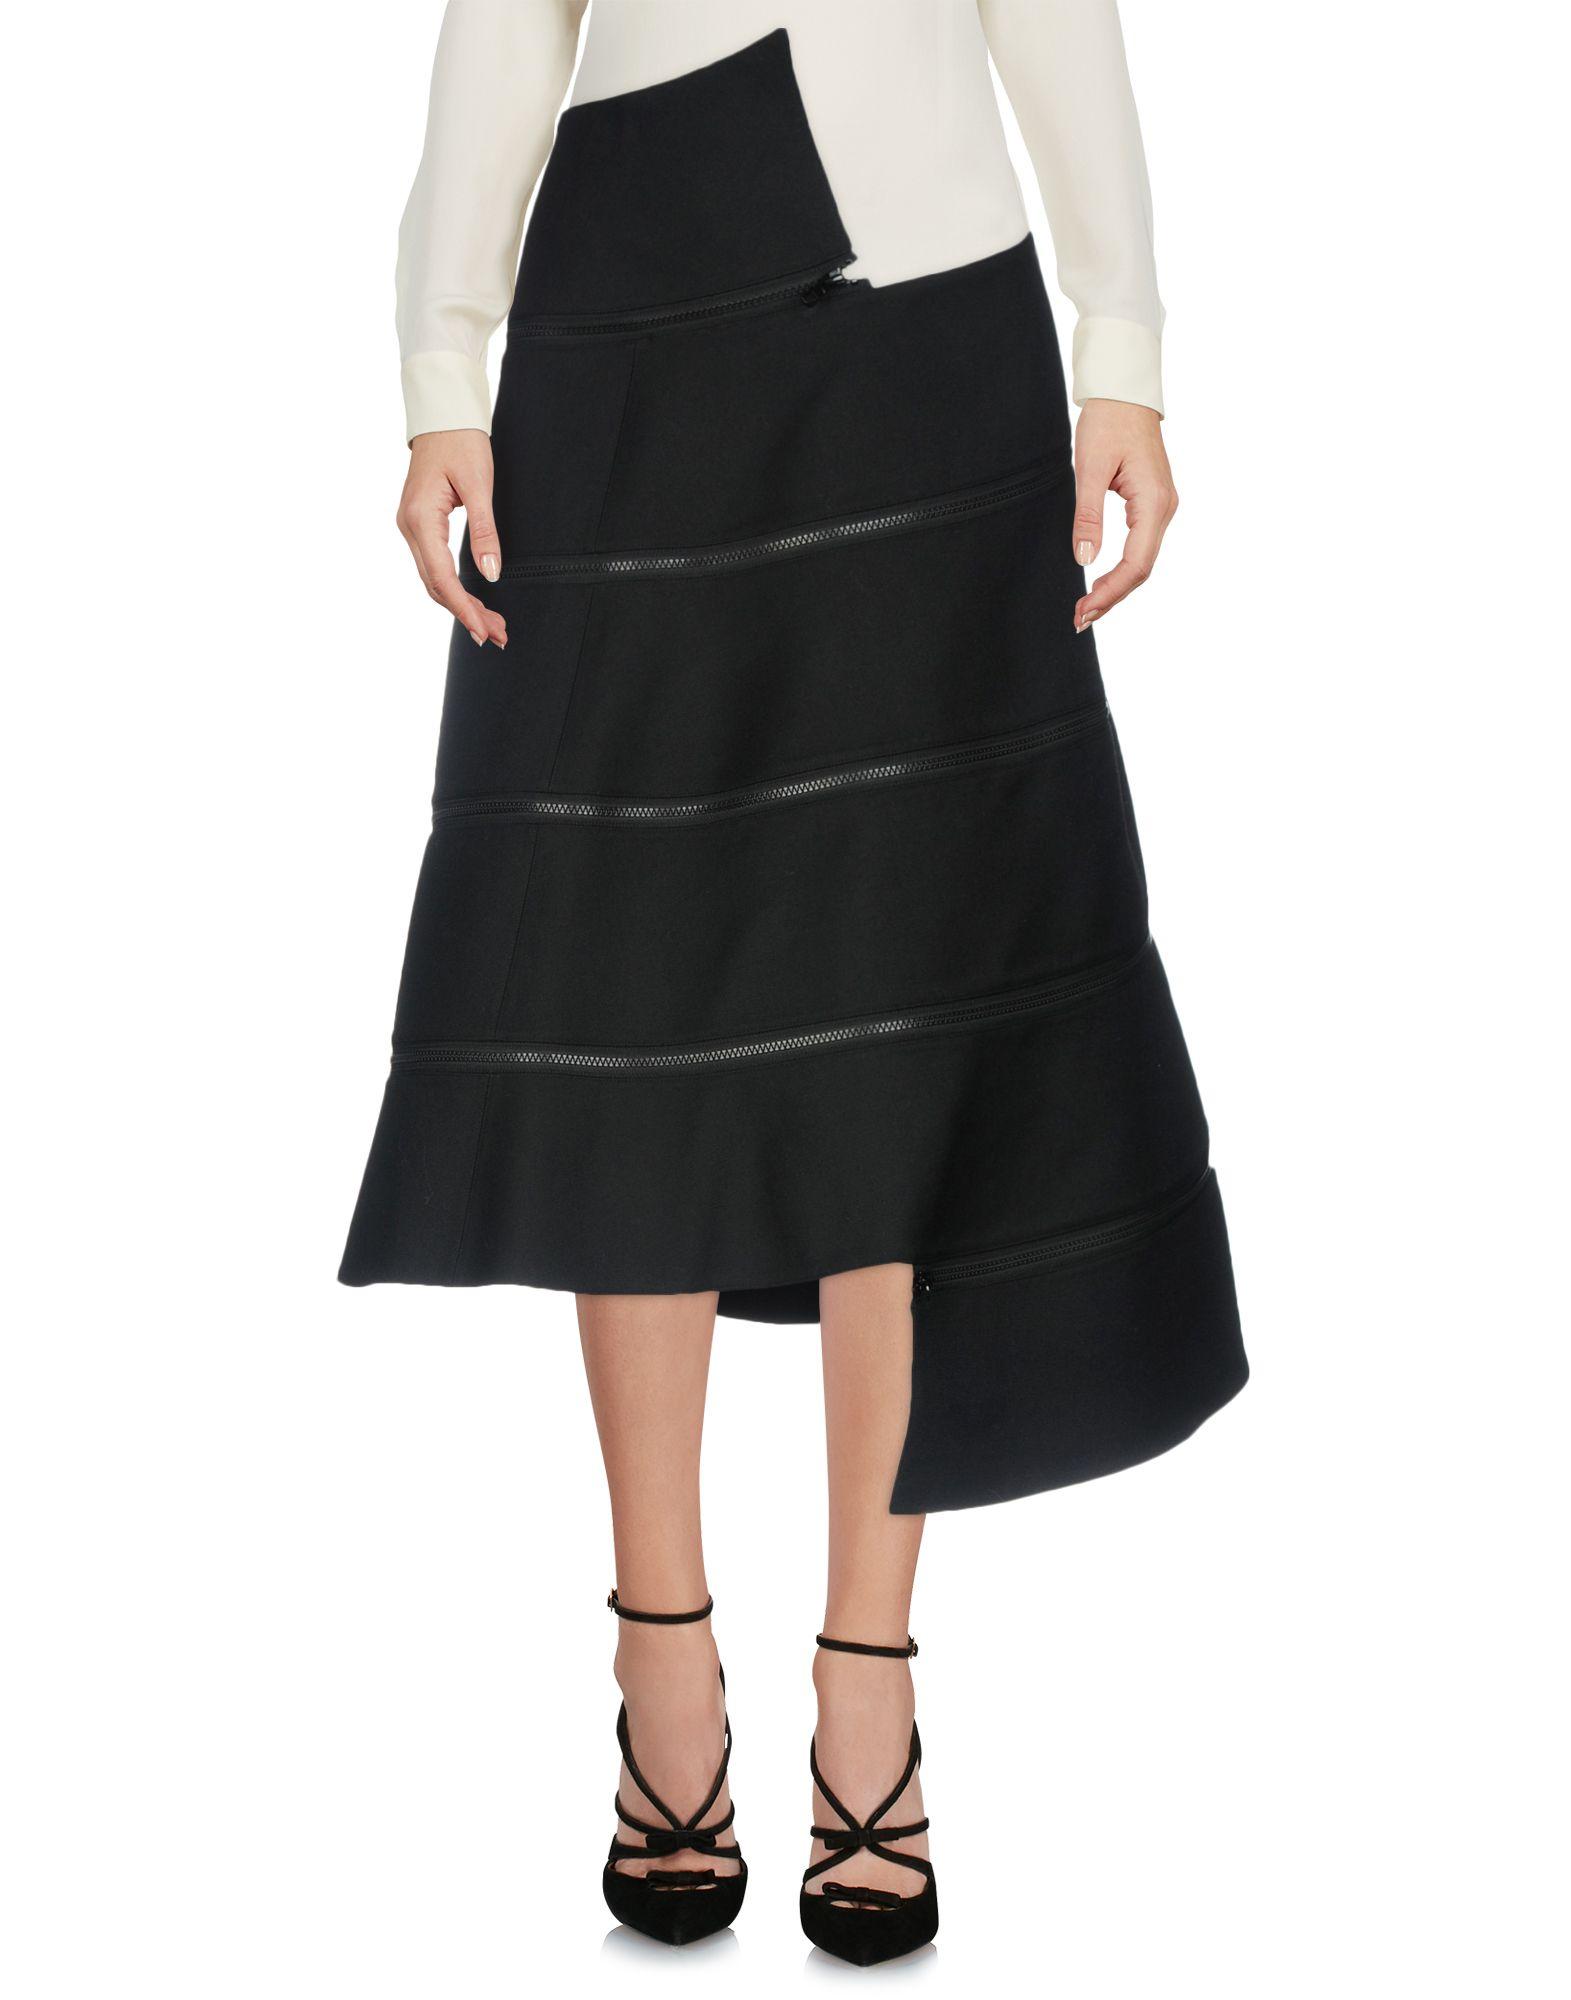 SKIRTS - 3/4 length skirts Junya Watanabe 2018 Newest s9HyRNQ2